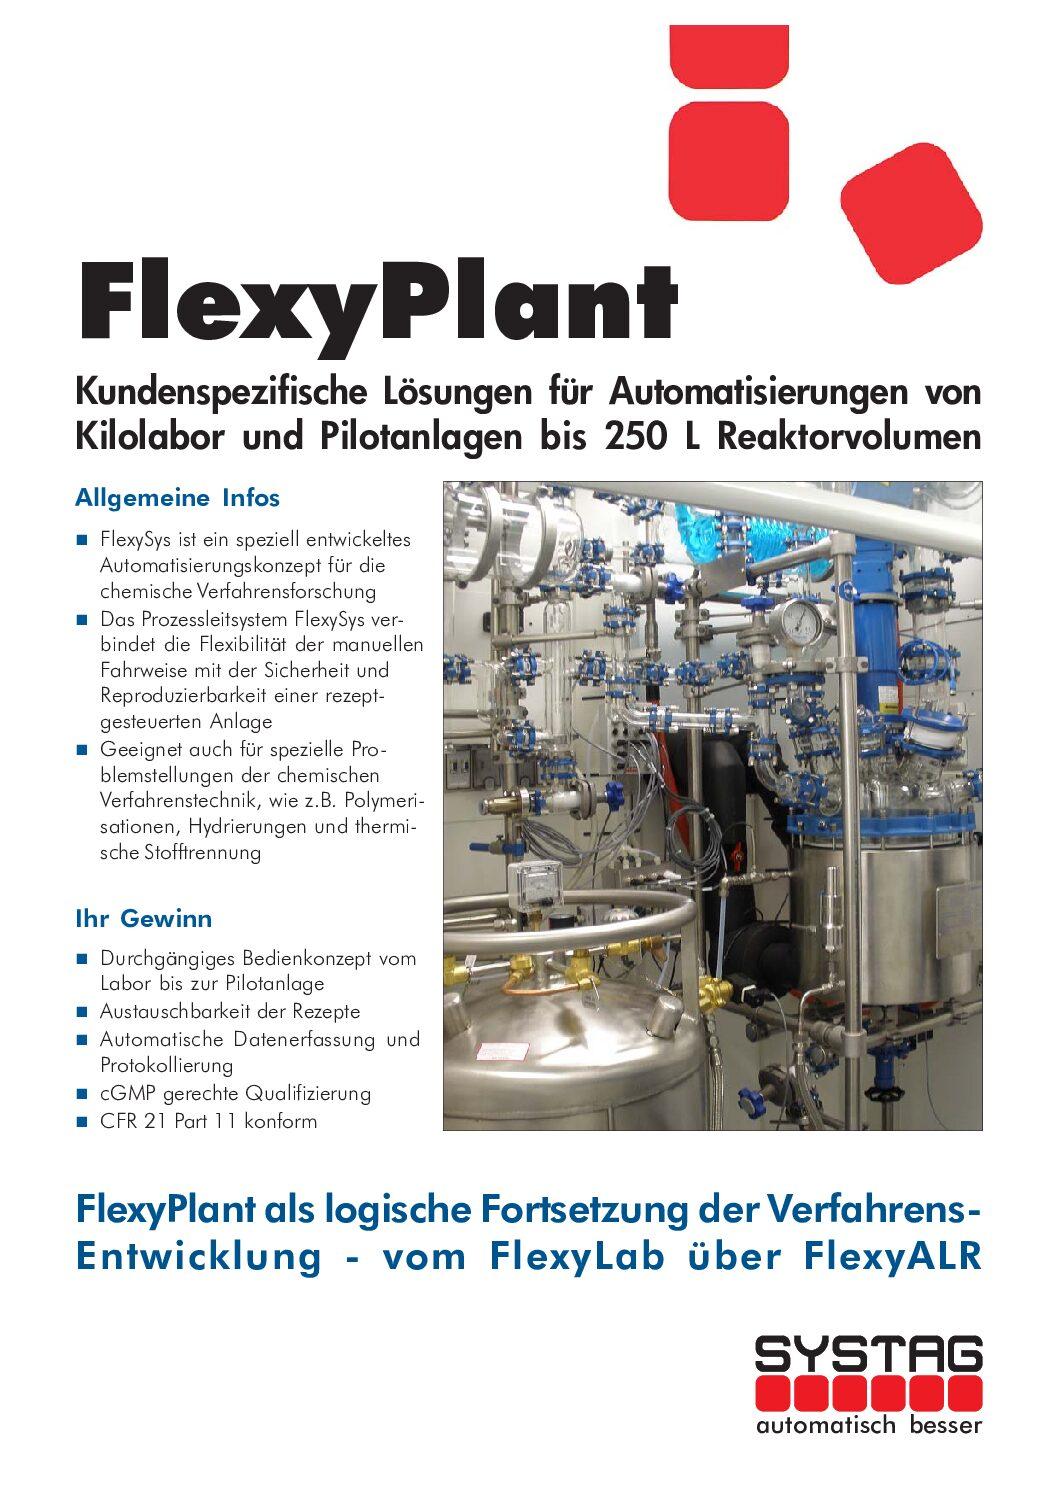 FlexyPlant